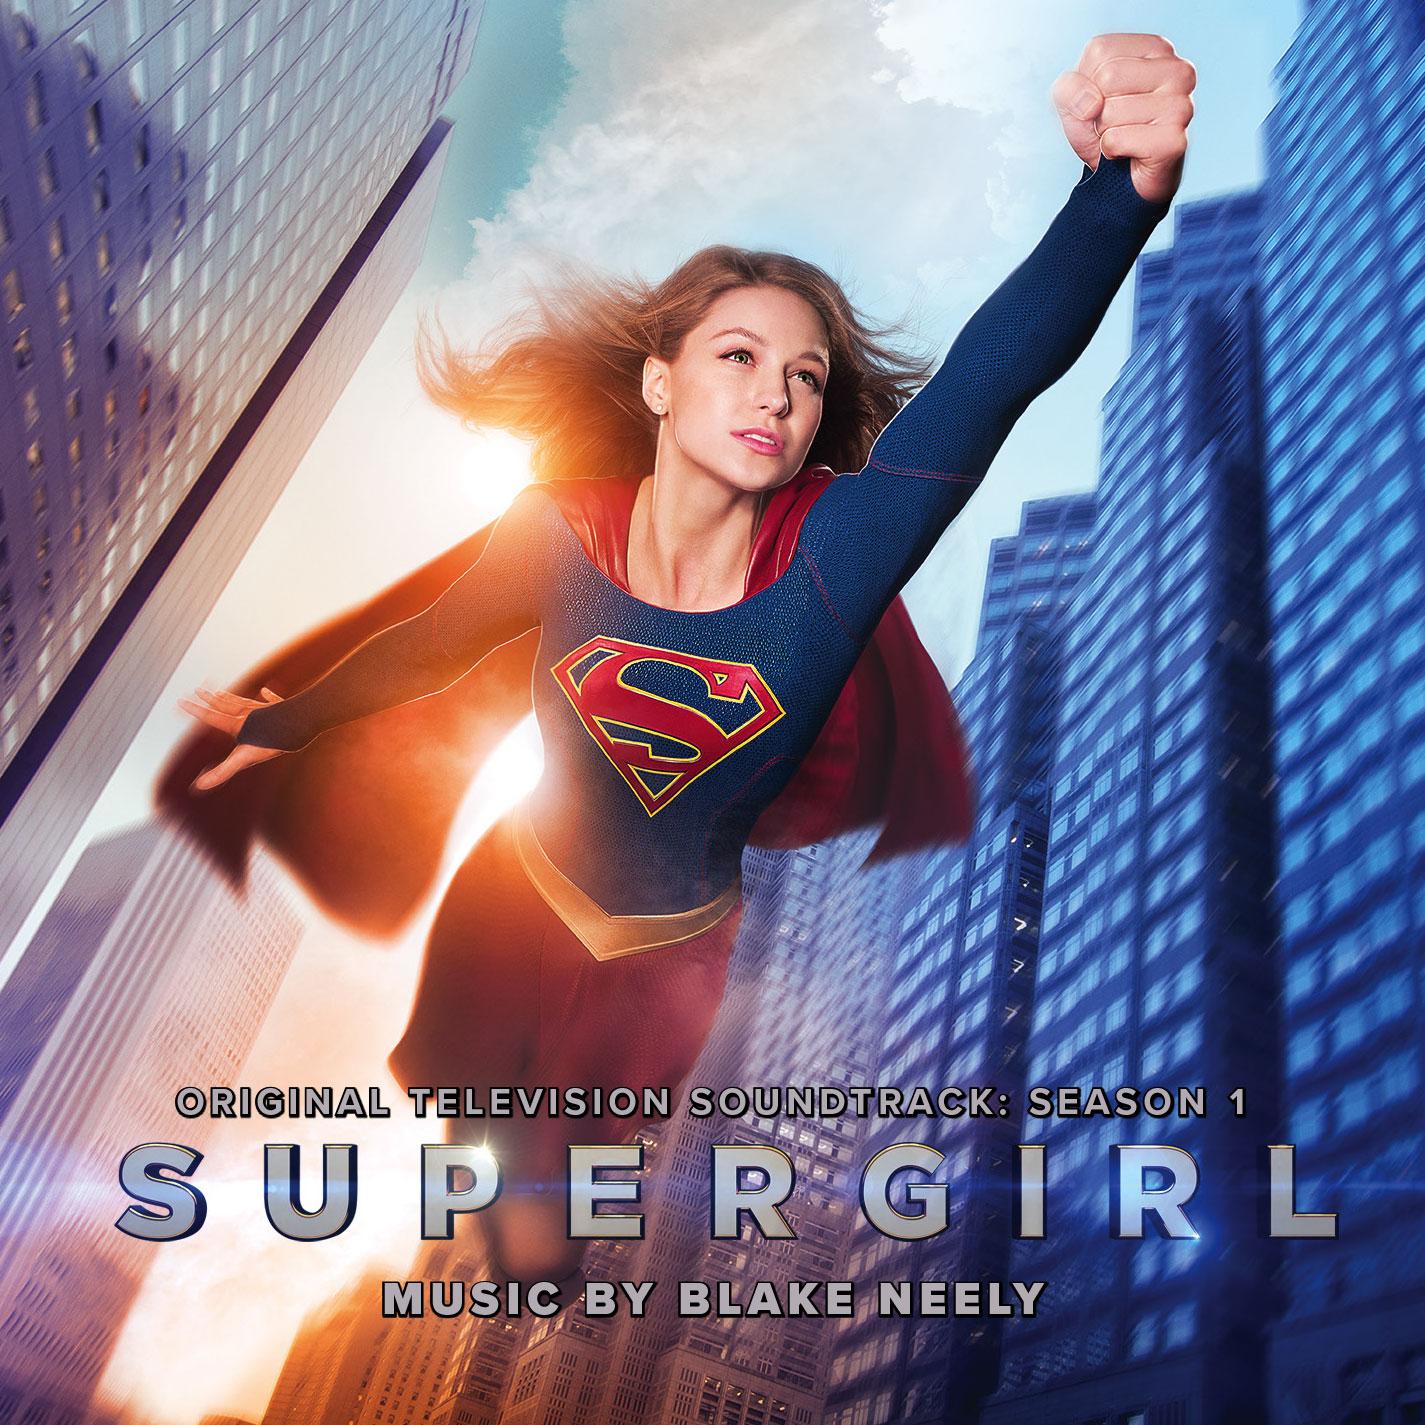 Supergirl Season 1 Original Television Soundtrack